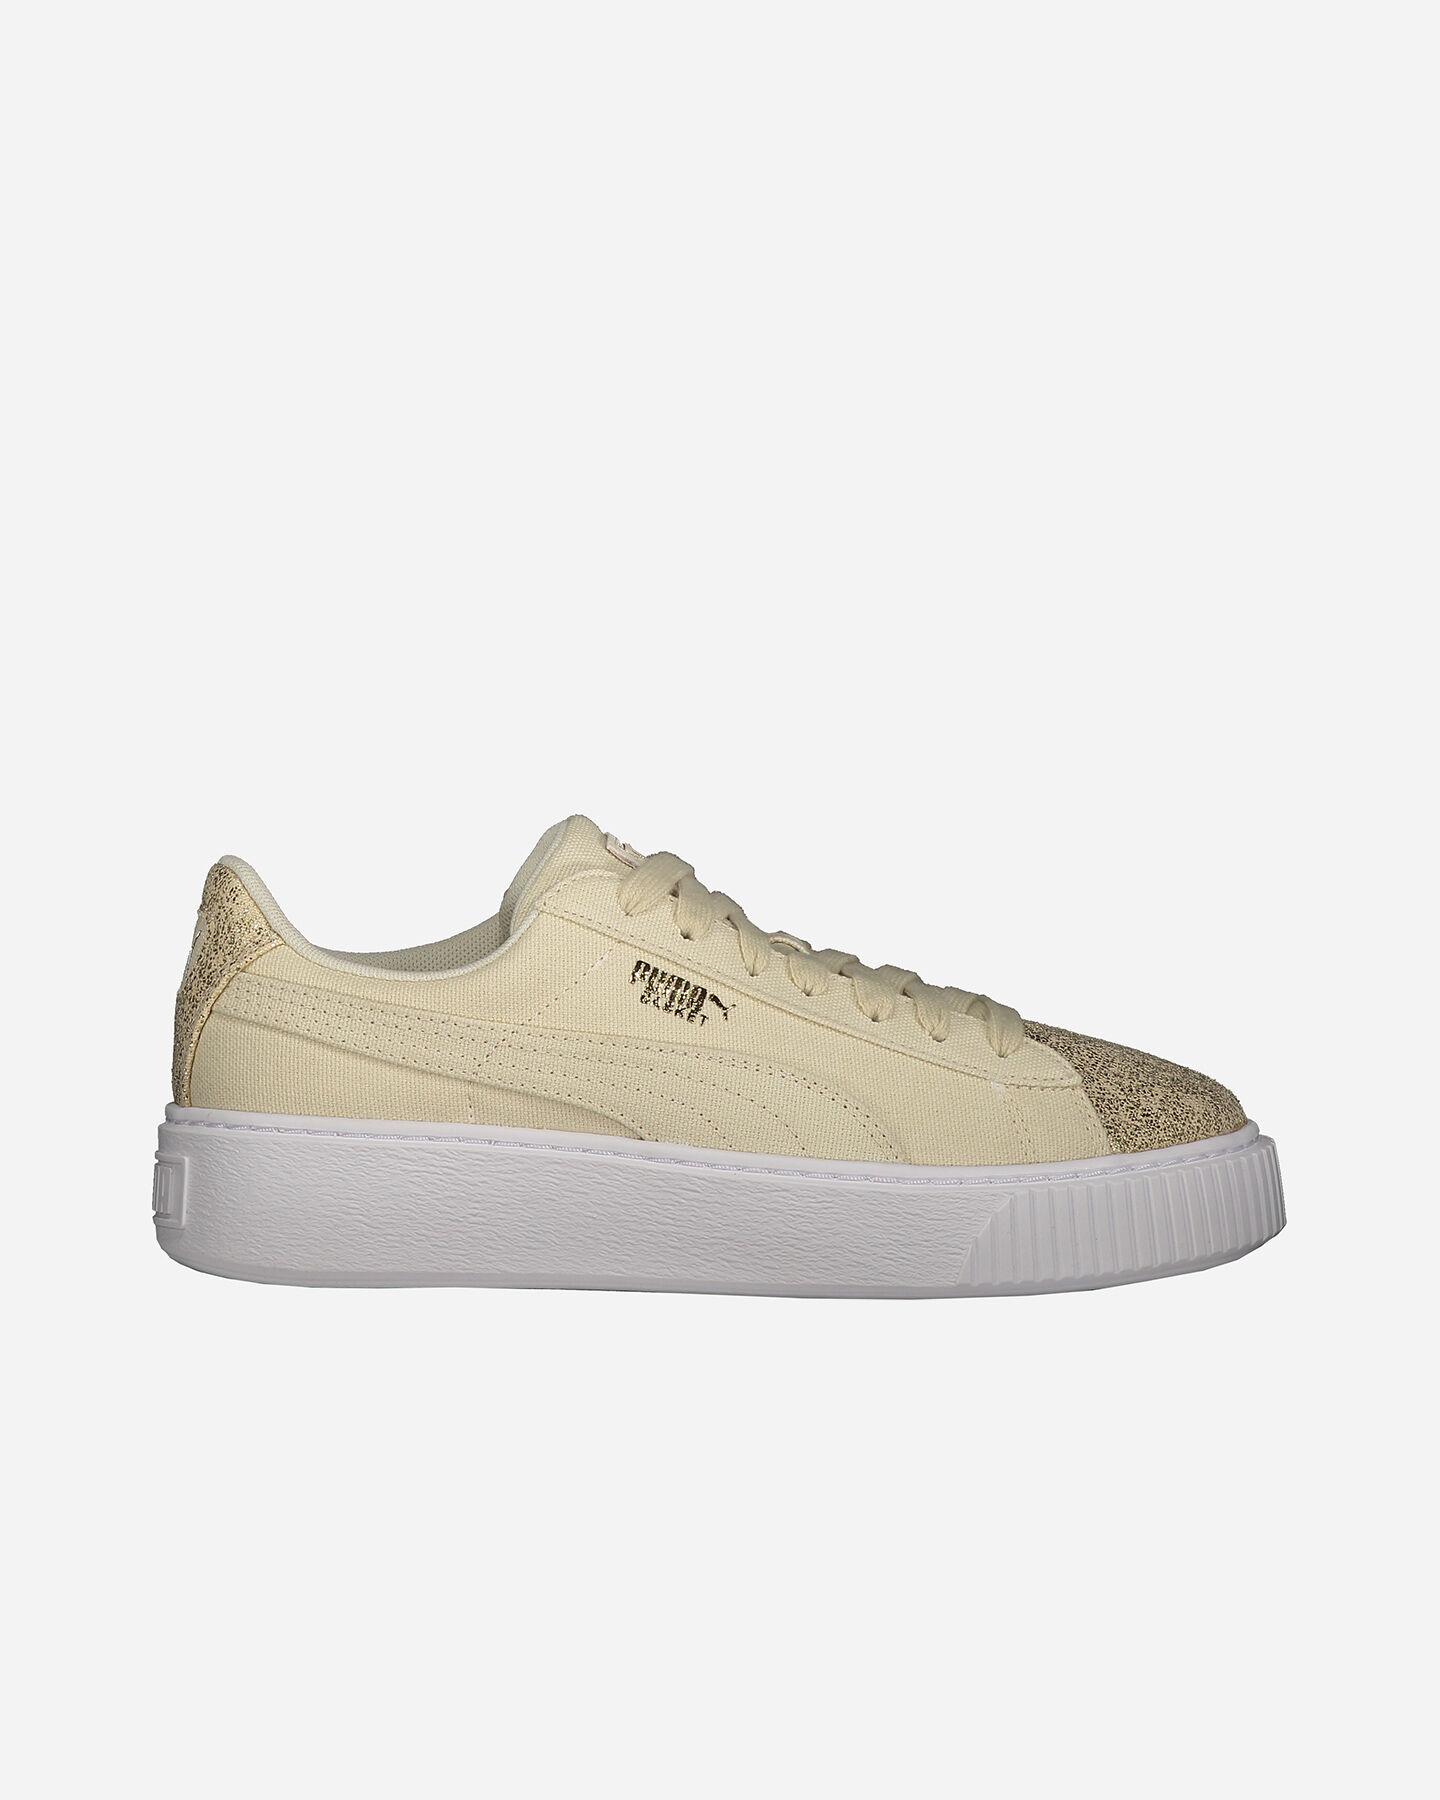 366494 Su Puma Scarpe 001 W Basket Sneakers Platform Canvas 8BBIUq